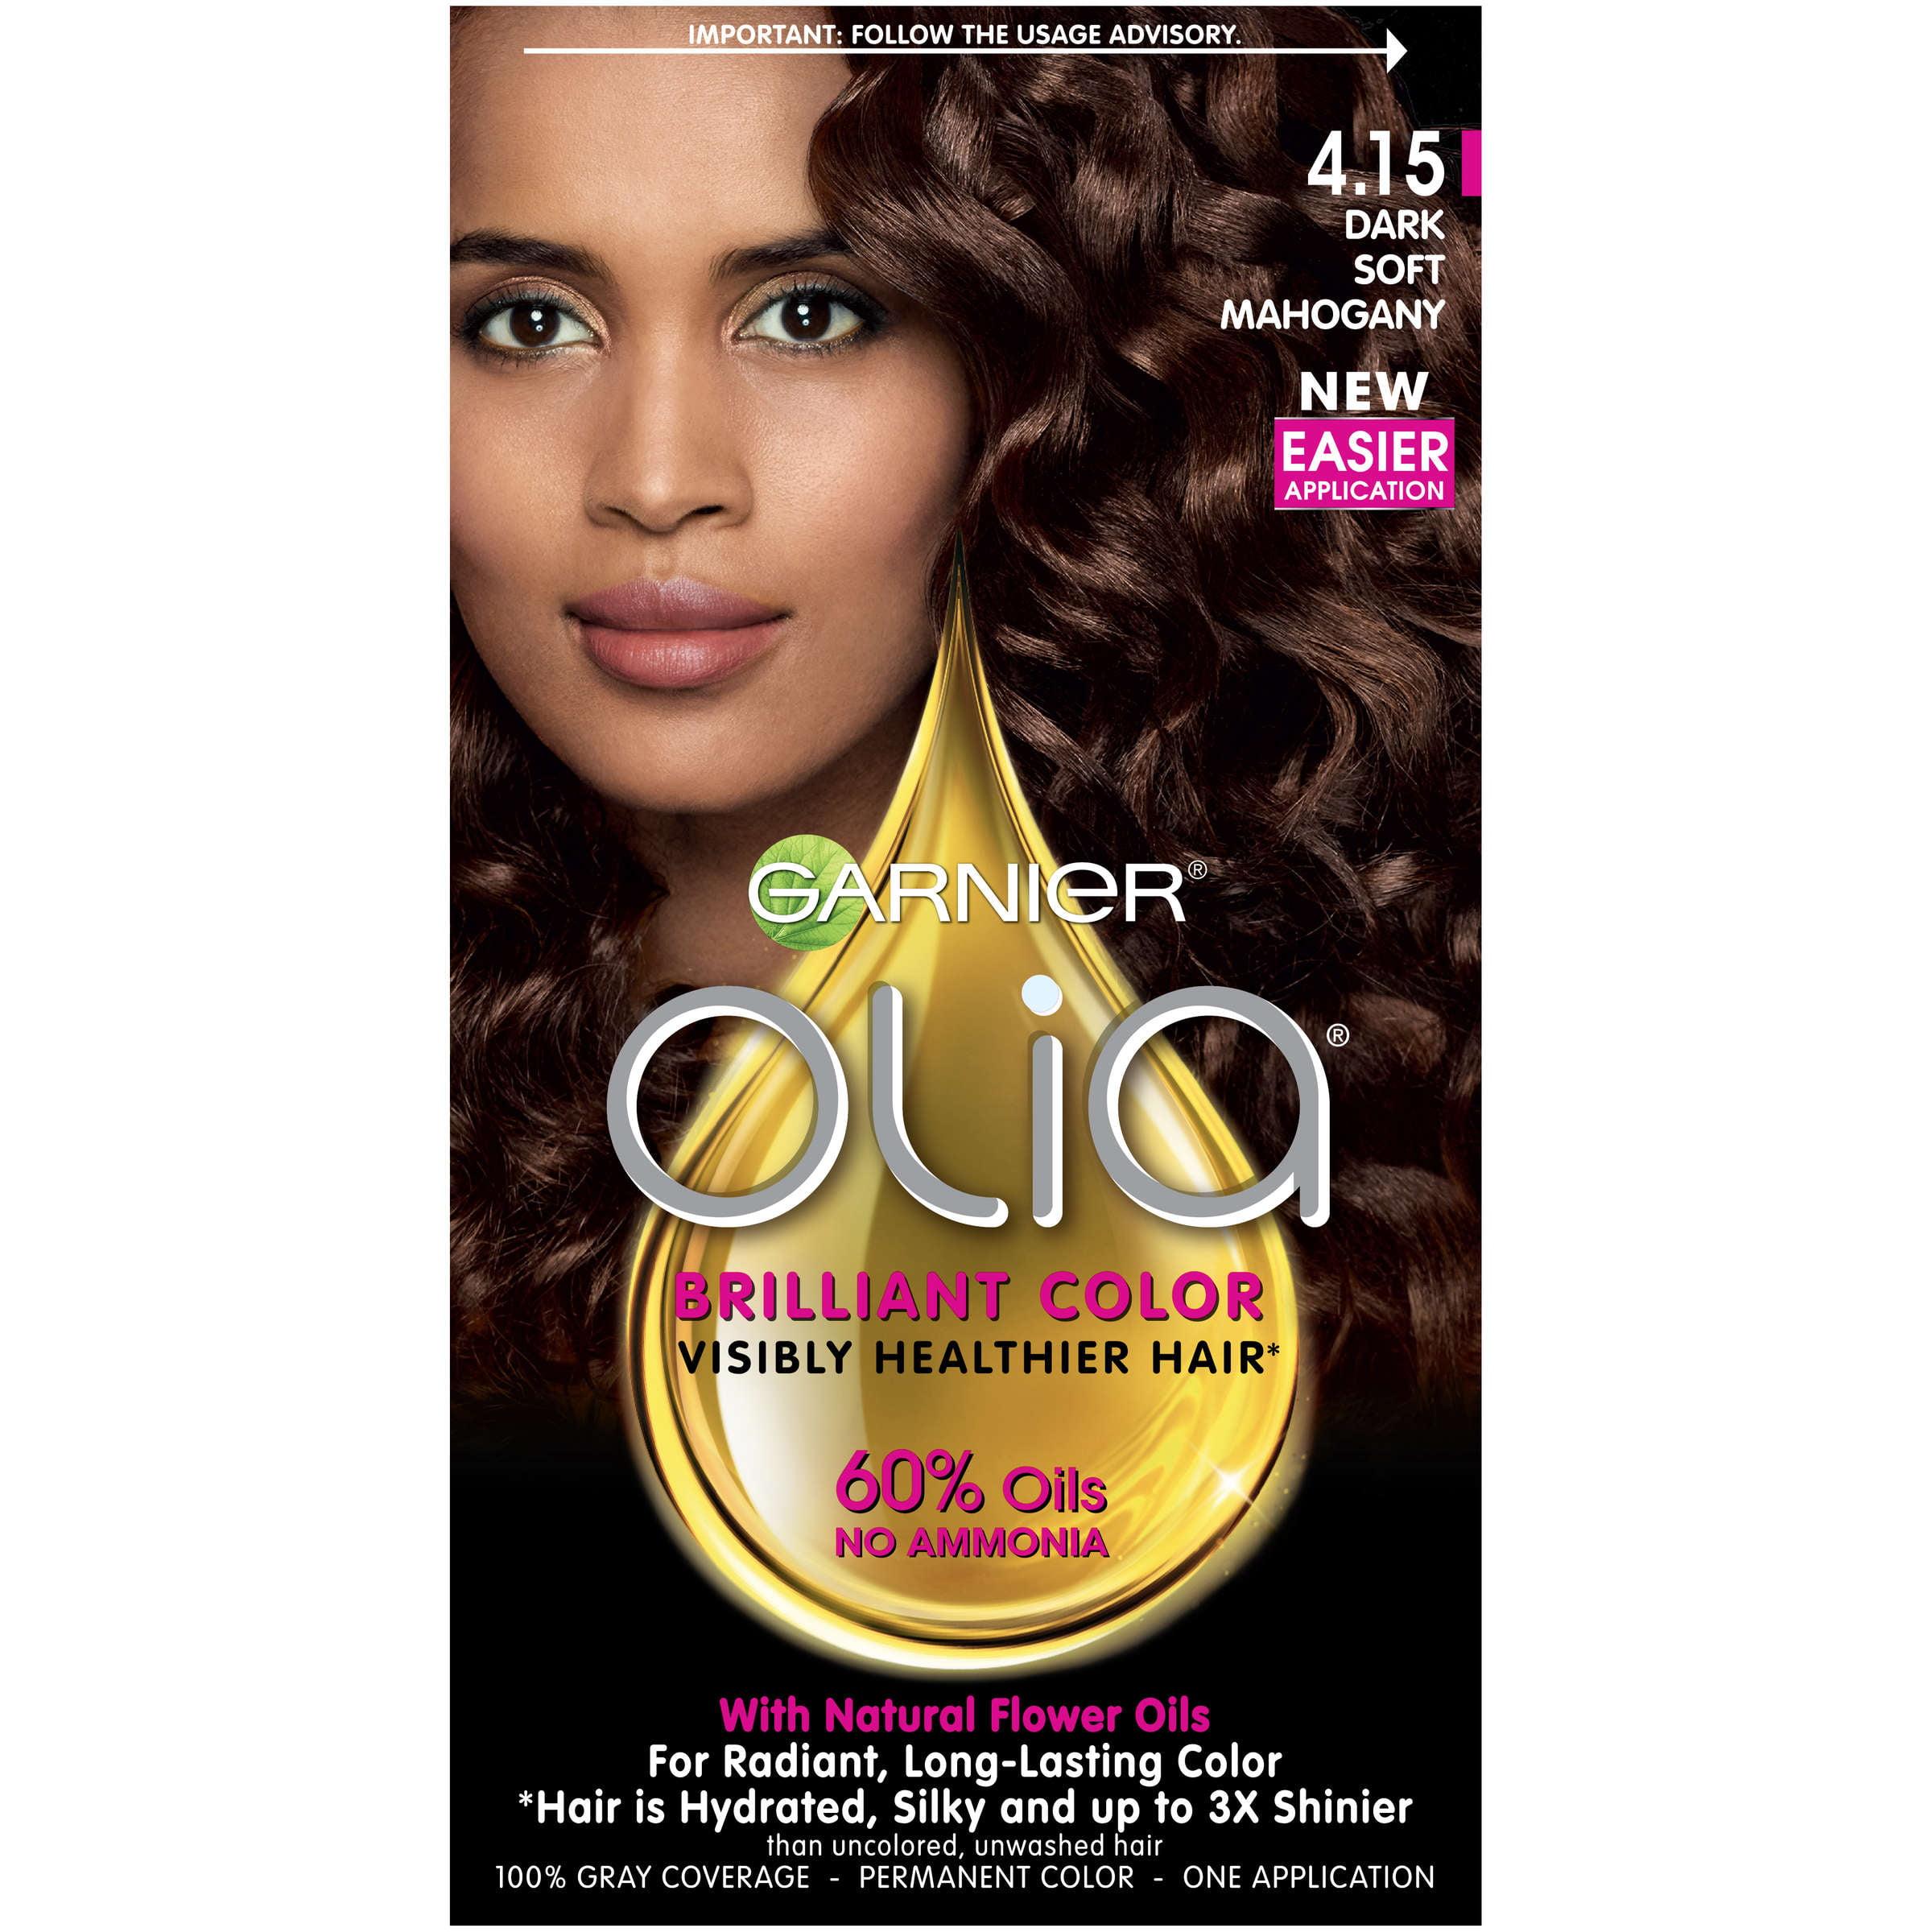 Garnier Olia Oil Powered Permanent Hair Color, 4.15 Dark Soft Mahogany, 1.0 CT